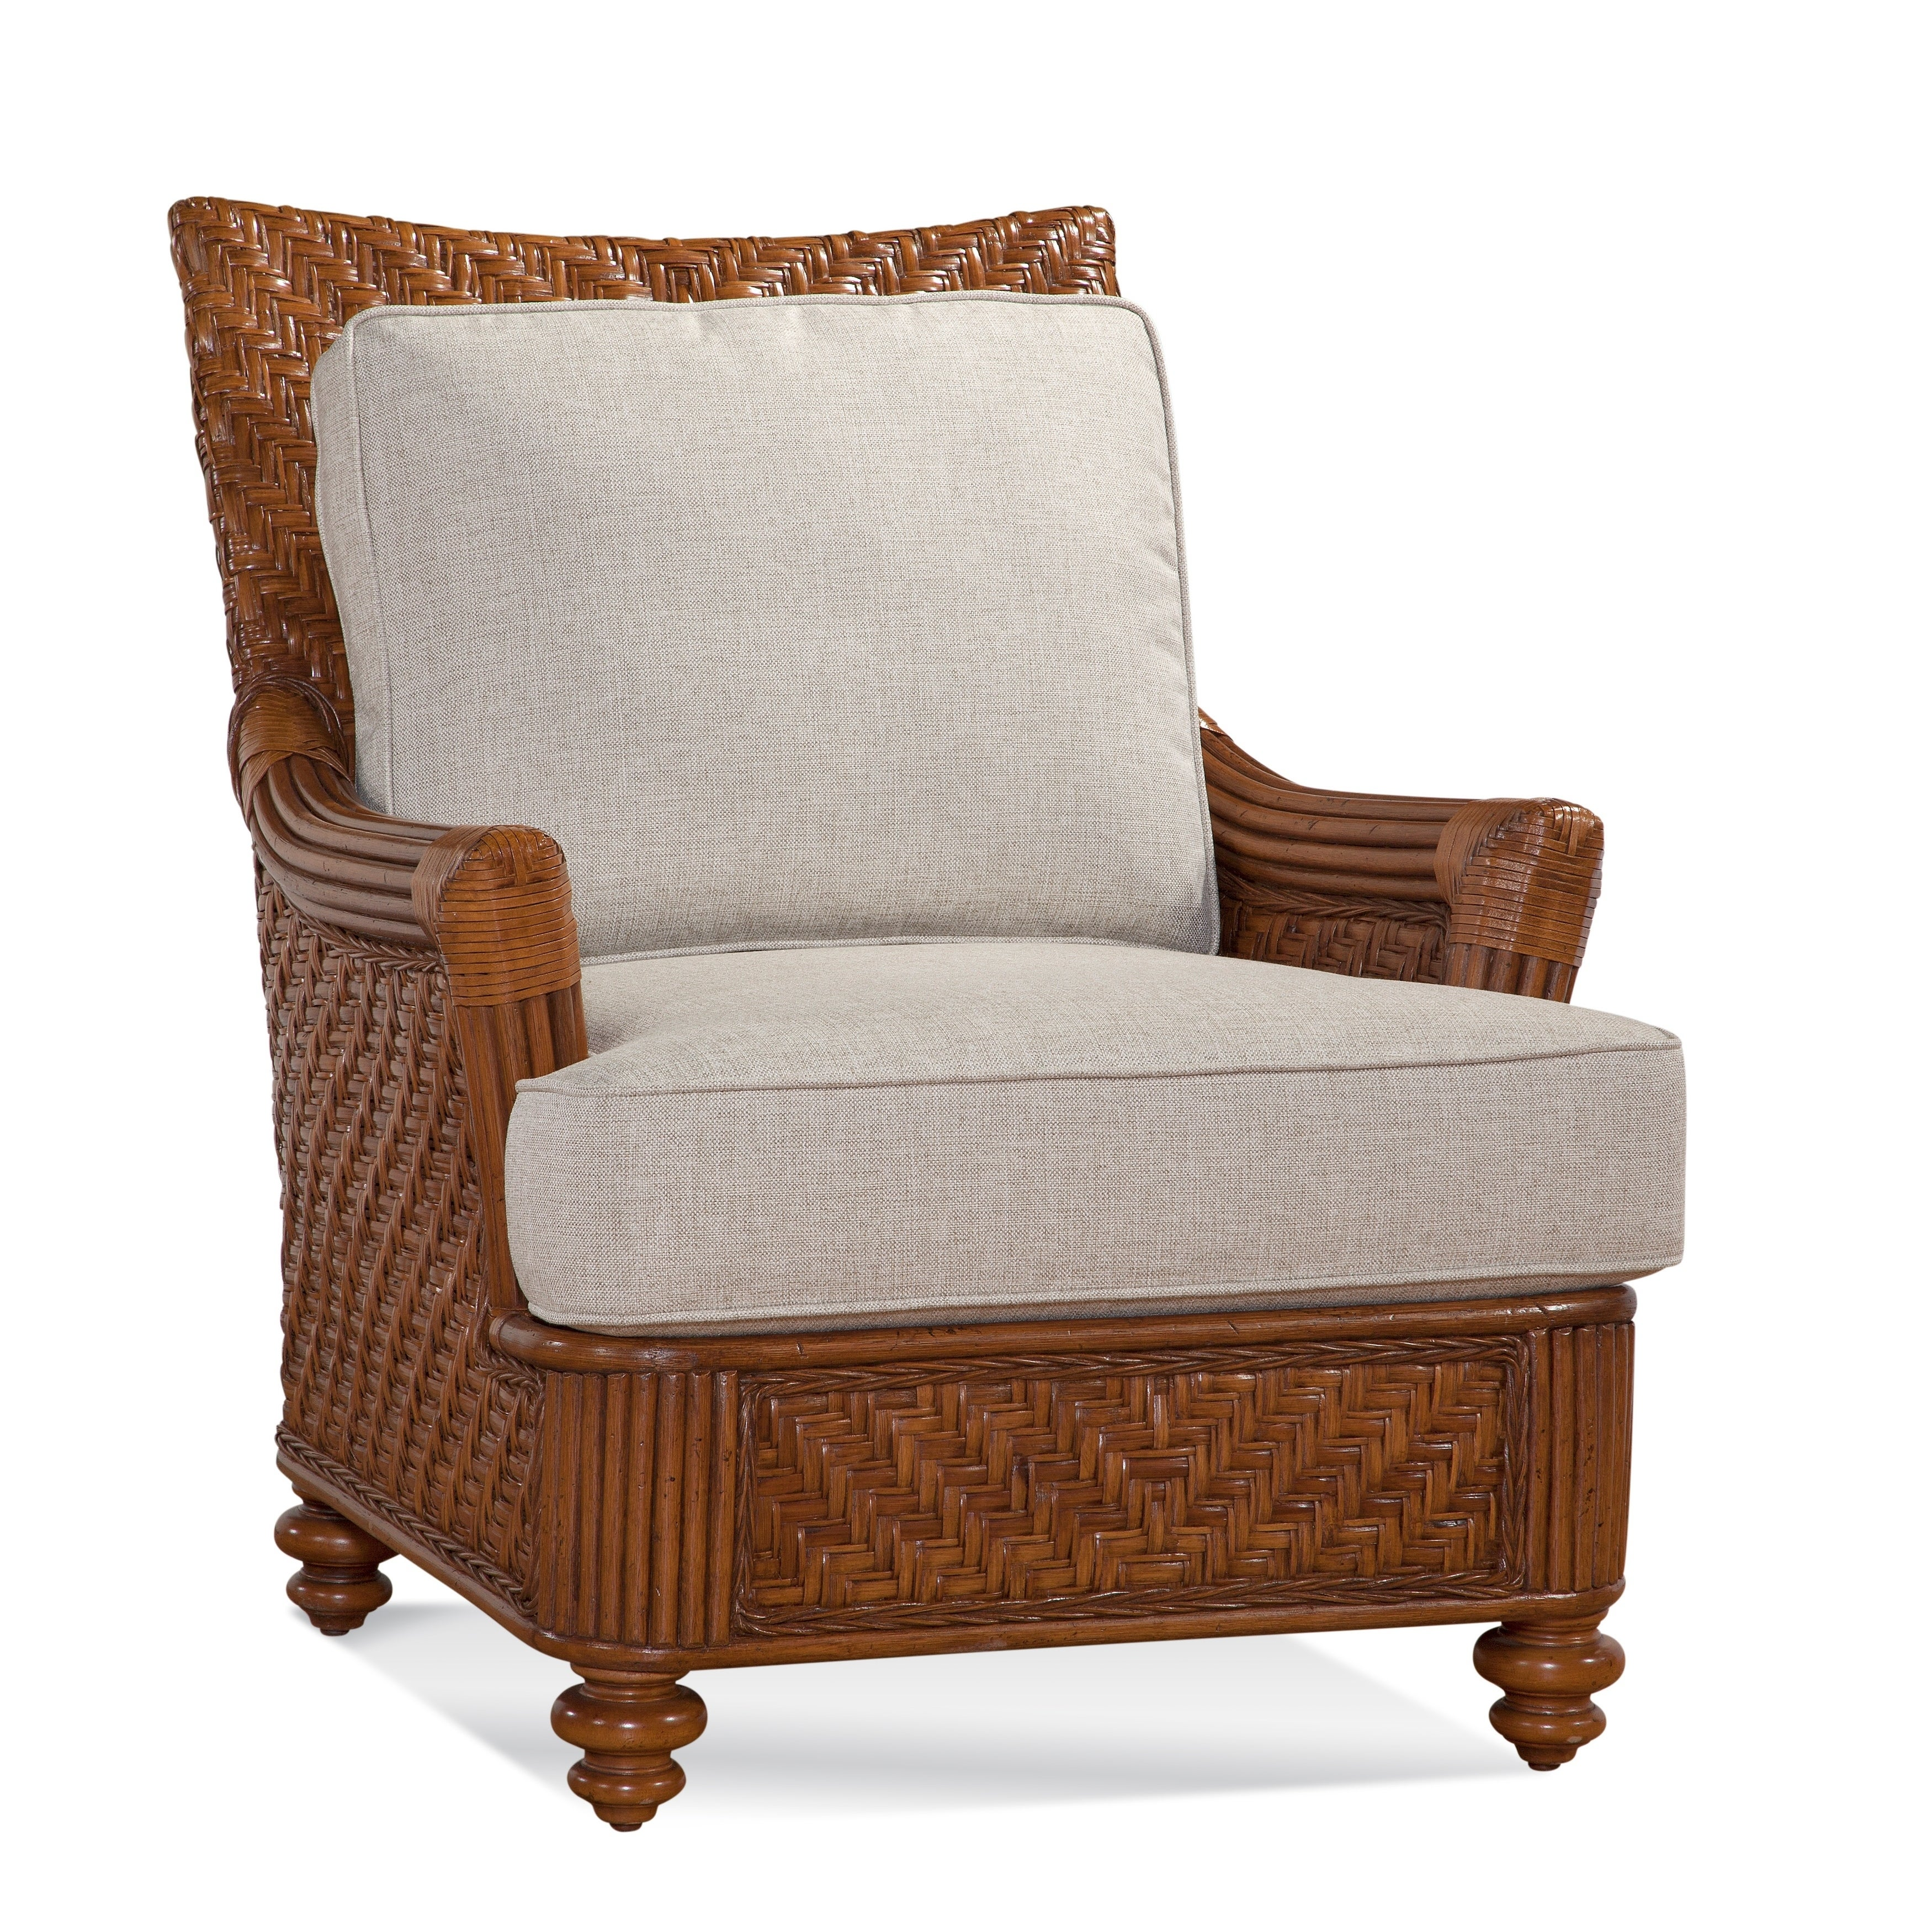 Braxton Culler Topsail Indoor Wicker Chair